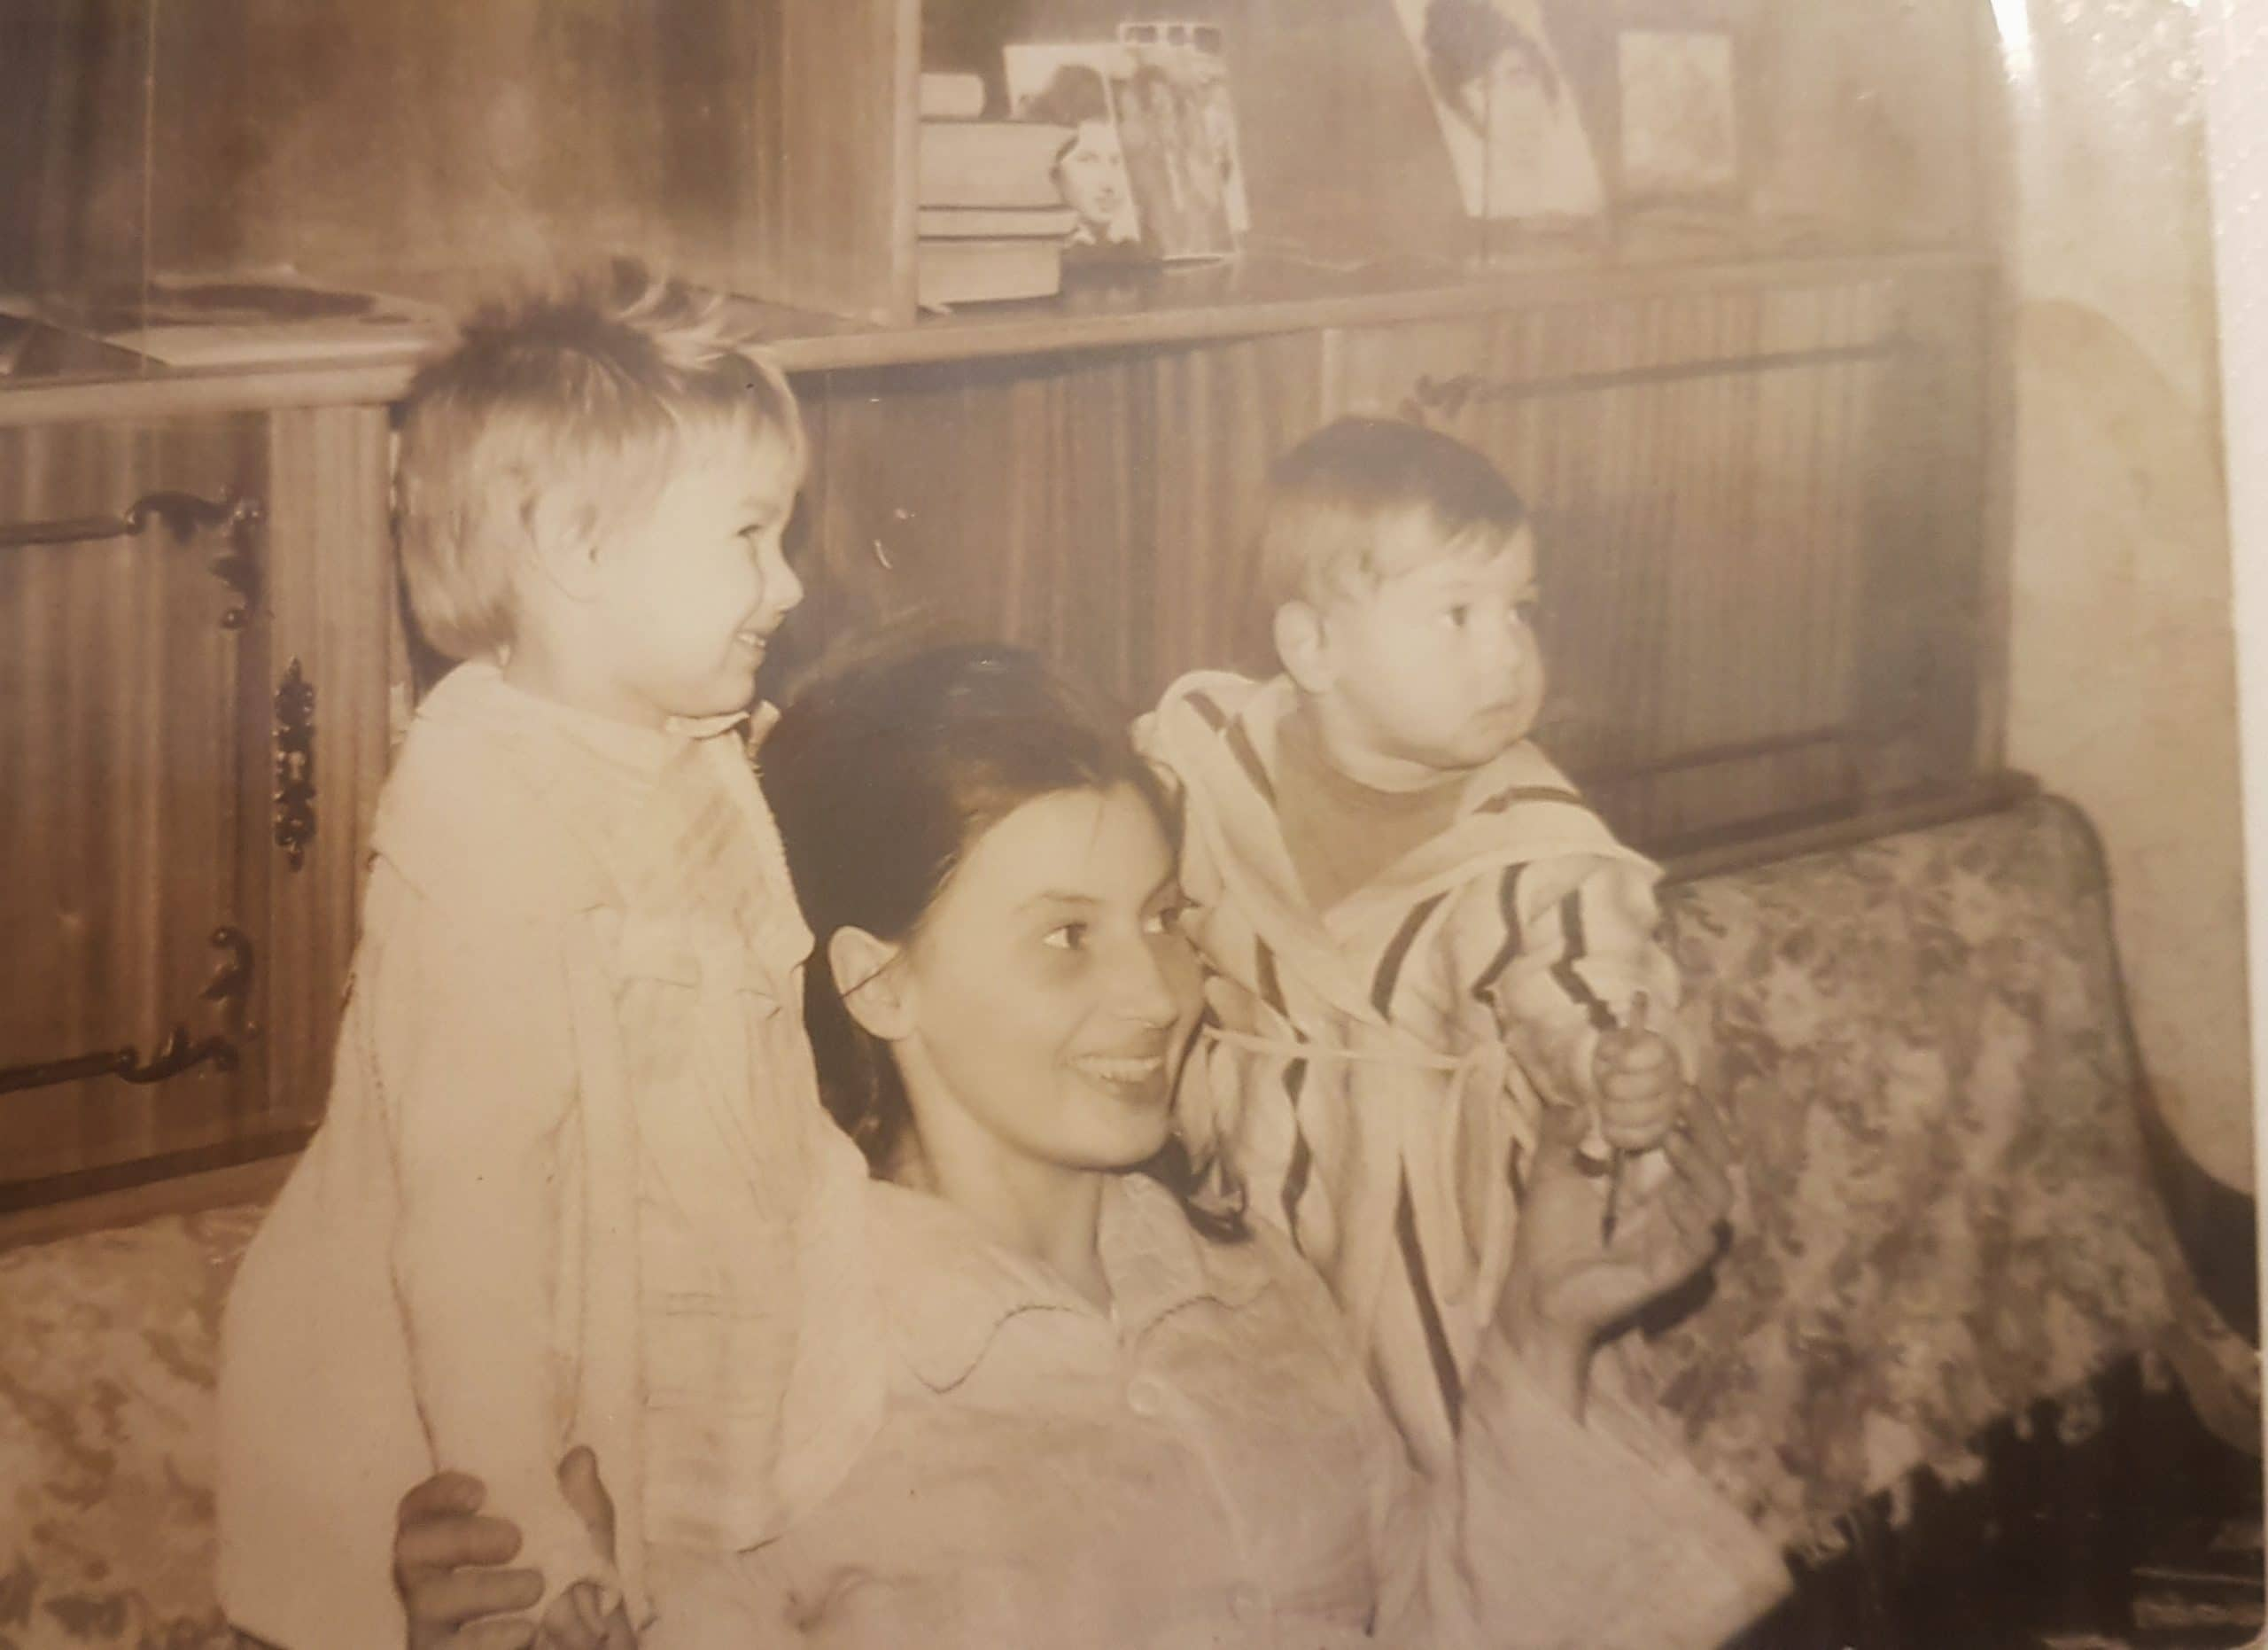 Cum era sarbatorit botezul inainte de '89